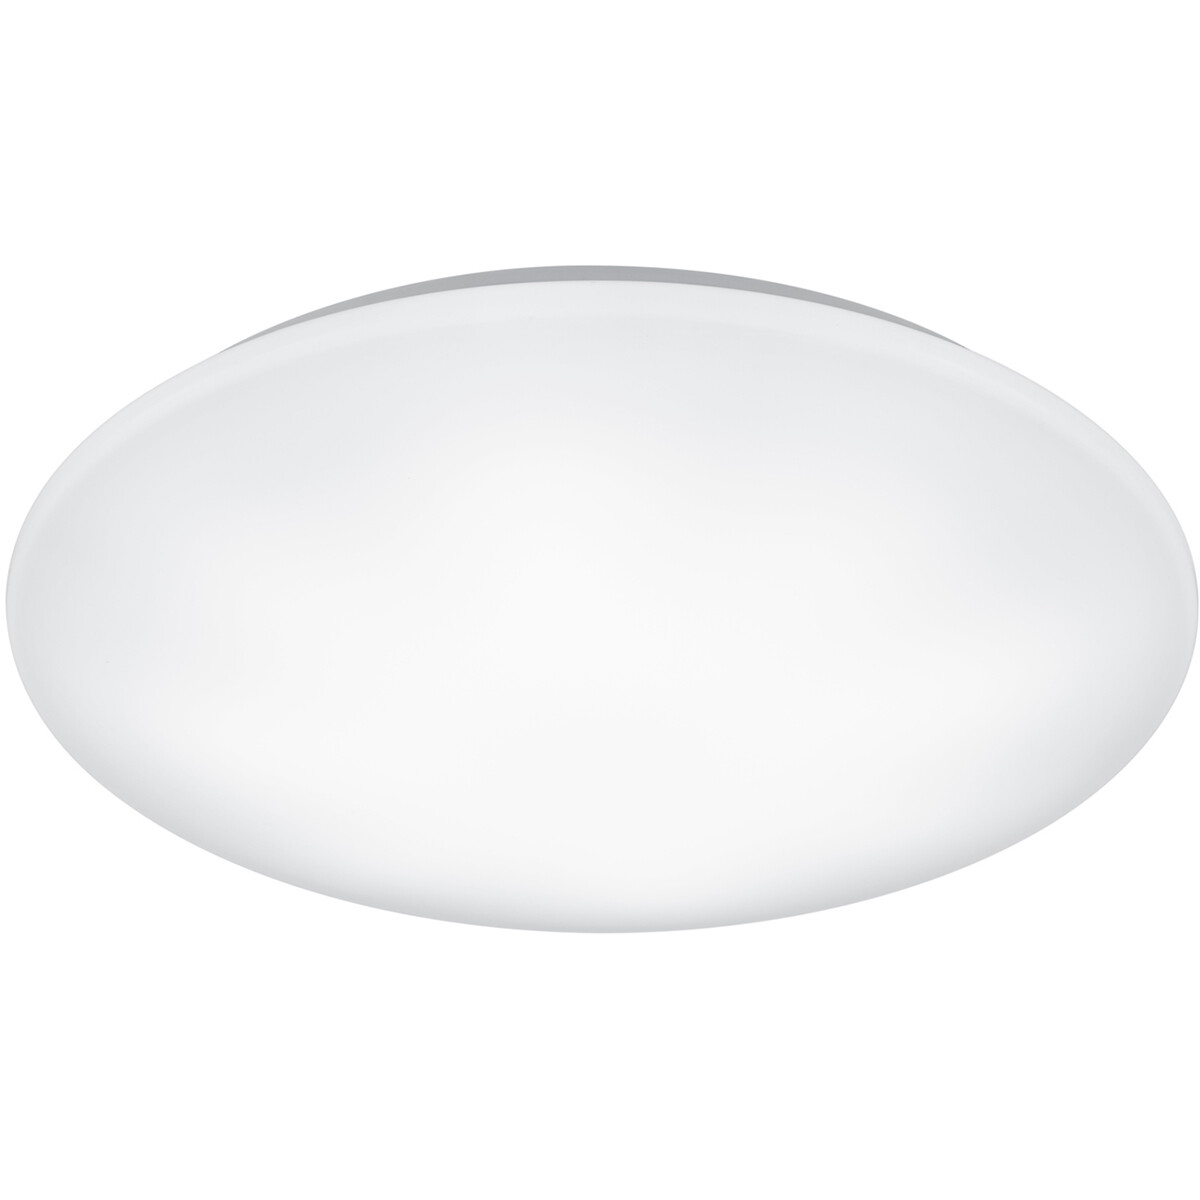 LED Plafondlamp - Trion Ster - 27W - Aanpasbare Kleur - Dimbaar - Afstandsbediening - Rond - Mat Wit